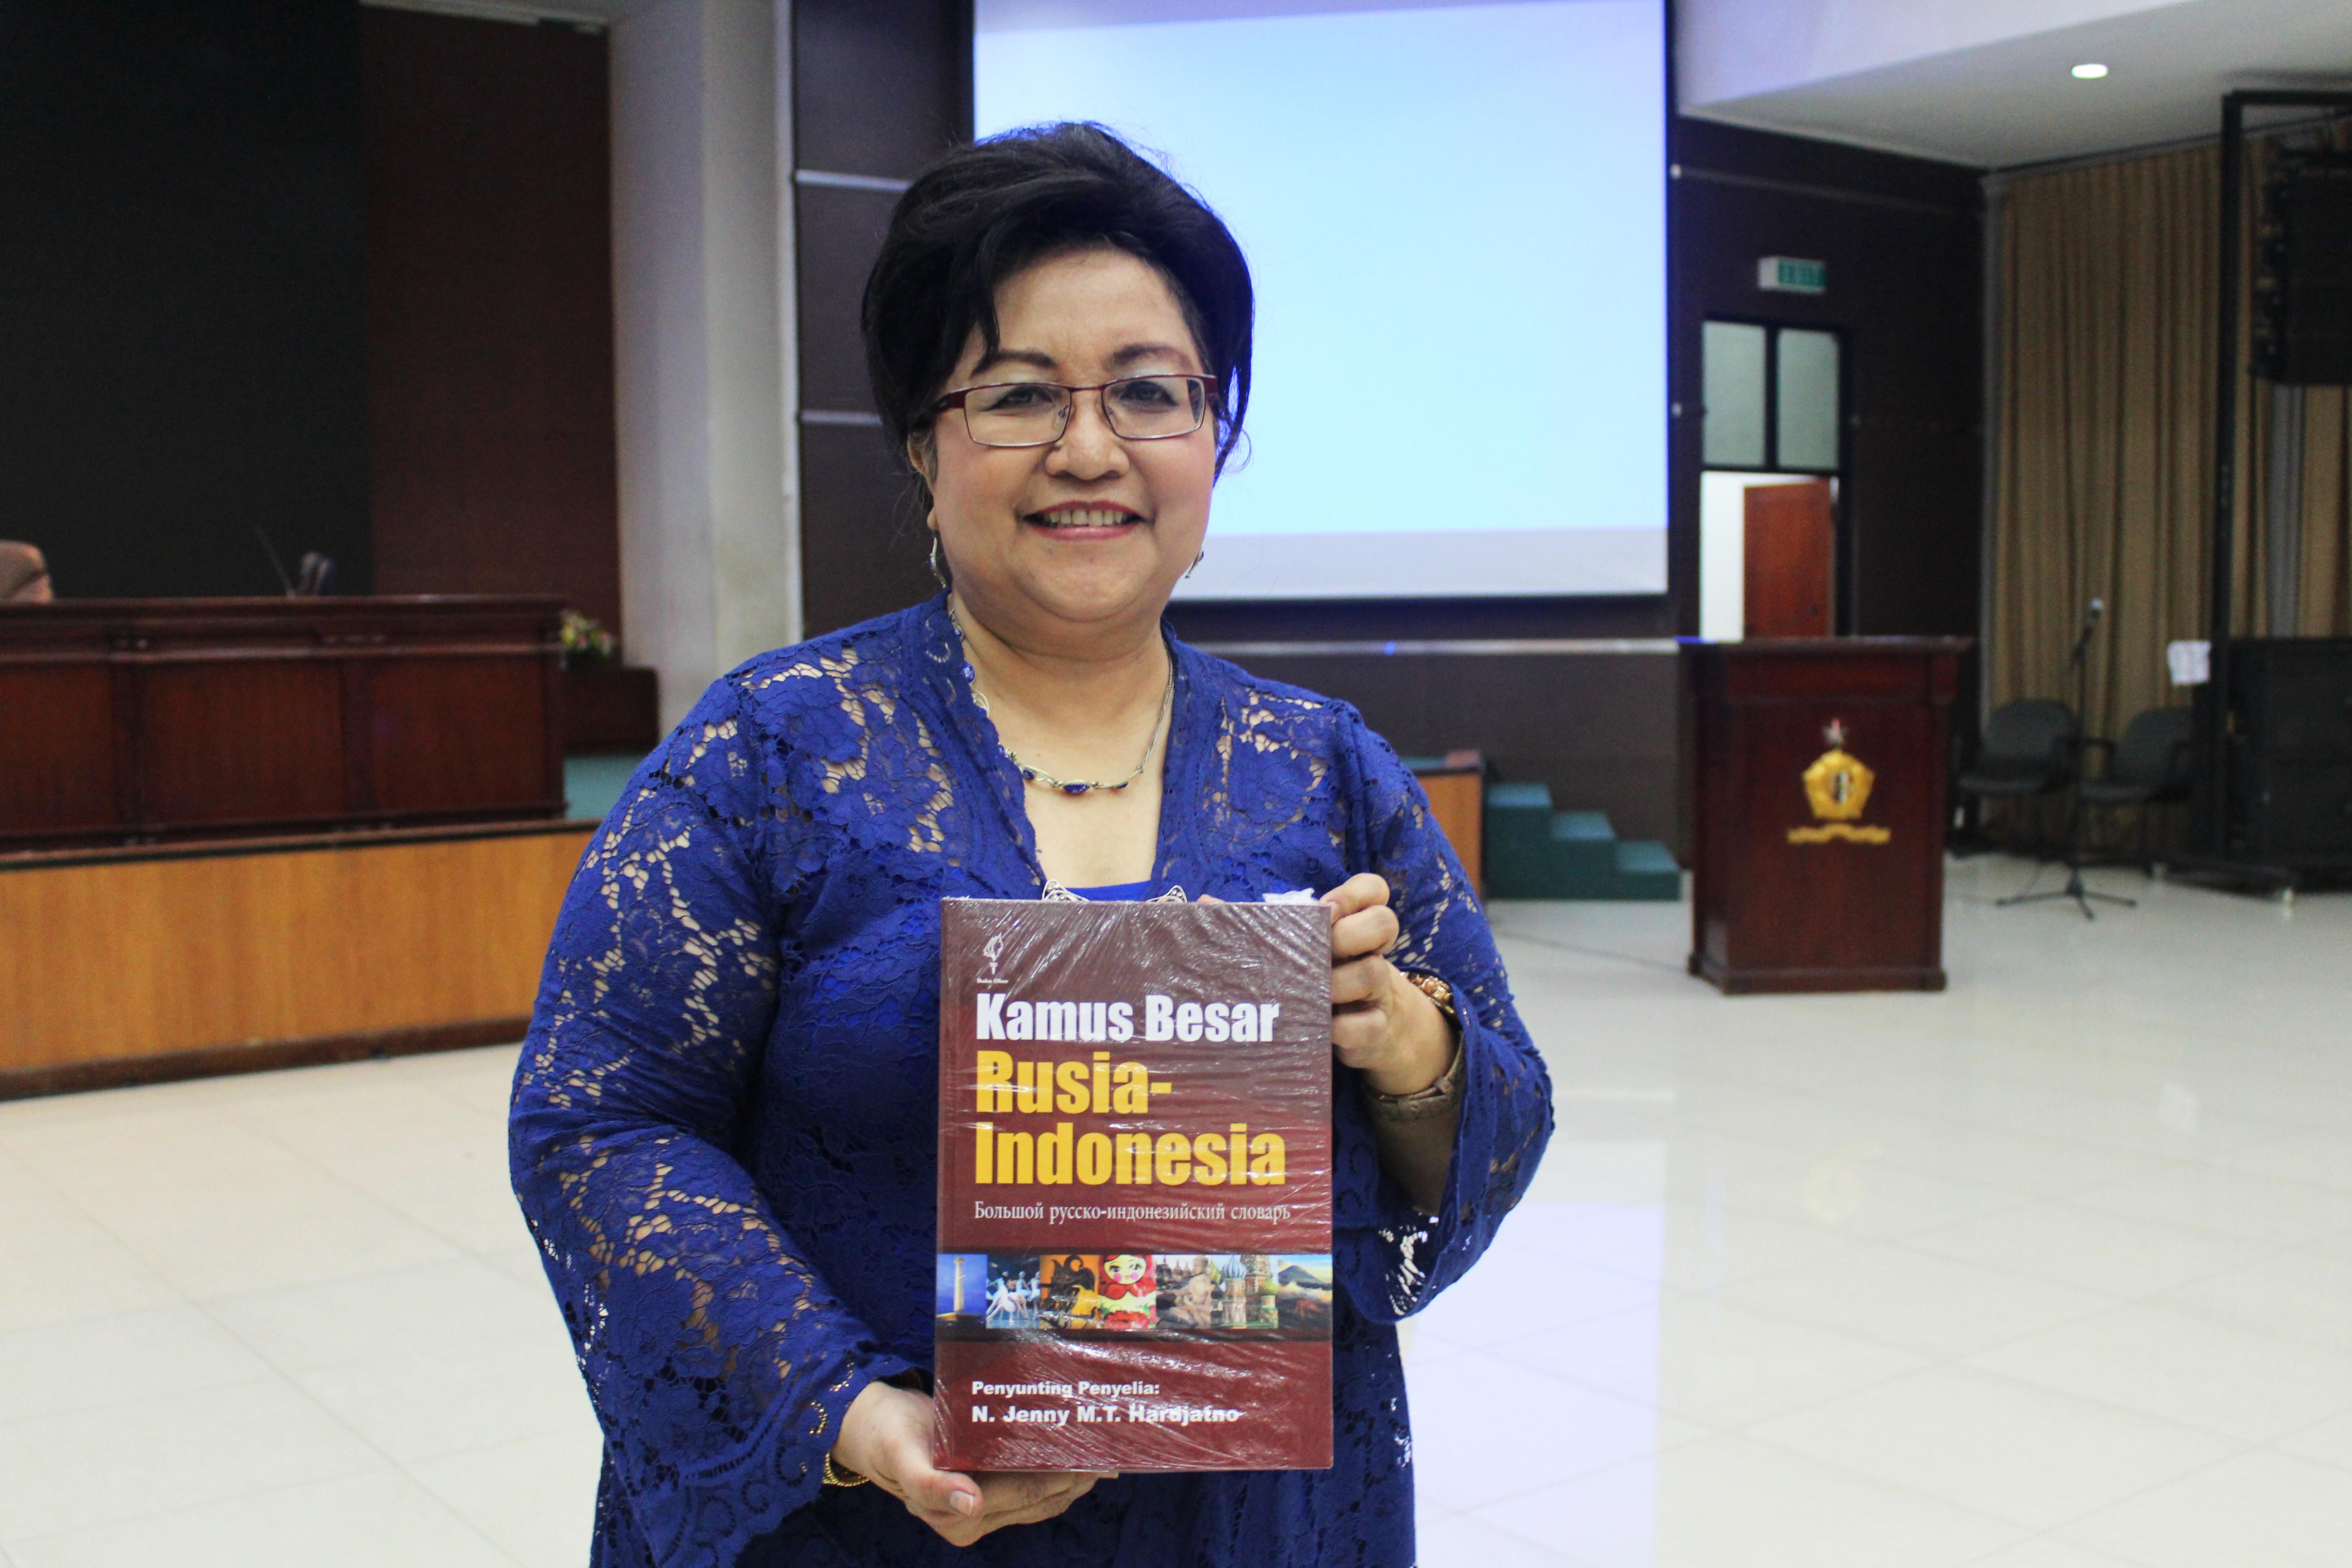 Prof. Dr. Njaju Jenny Malik Tomi Hardjatno adalah guru besar perempuan pertama di Indonesia untuk bidang linguistik bahasa Rusia. Saat ini, ia menjadi Guru Besar Tetap di Fakultas Ilmu Pengetahuan Budaya Universitas Indonesia (UI), Ketua Pusat Kajian Eropa UI, dan juga menjadi Tenaga Ahli Pengajar Bidang Sosial Budaya Lembaga Ketahanan Nasional Republik Indonesia.